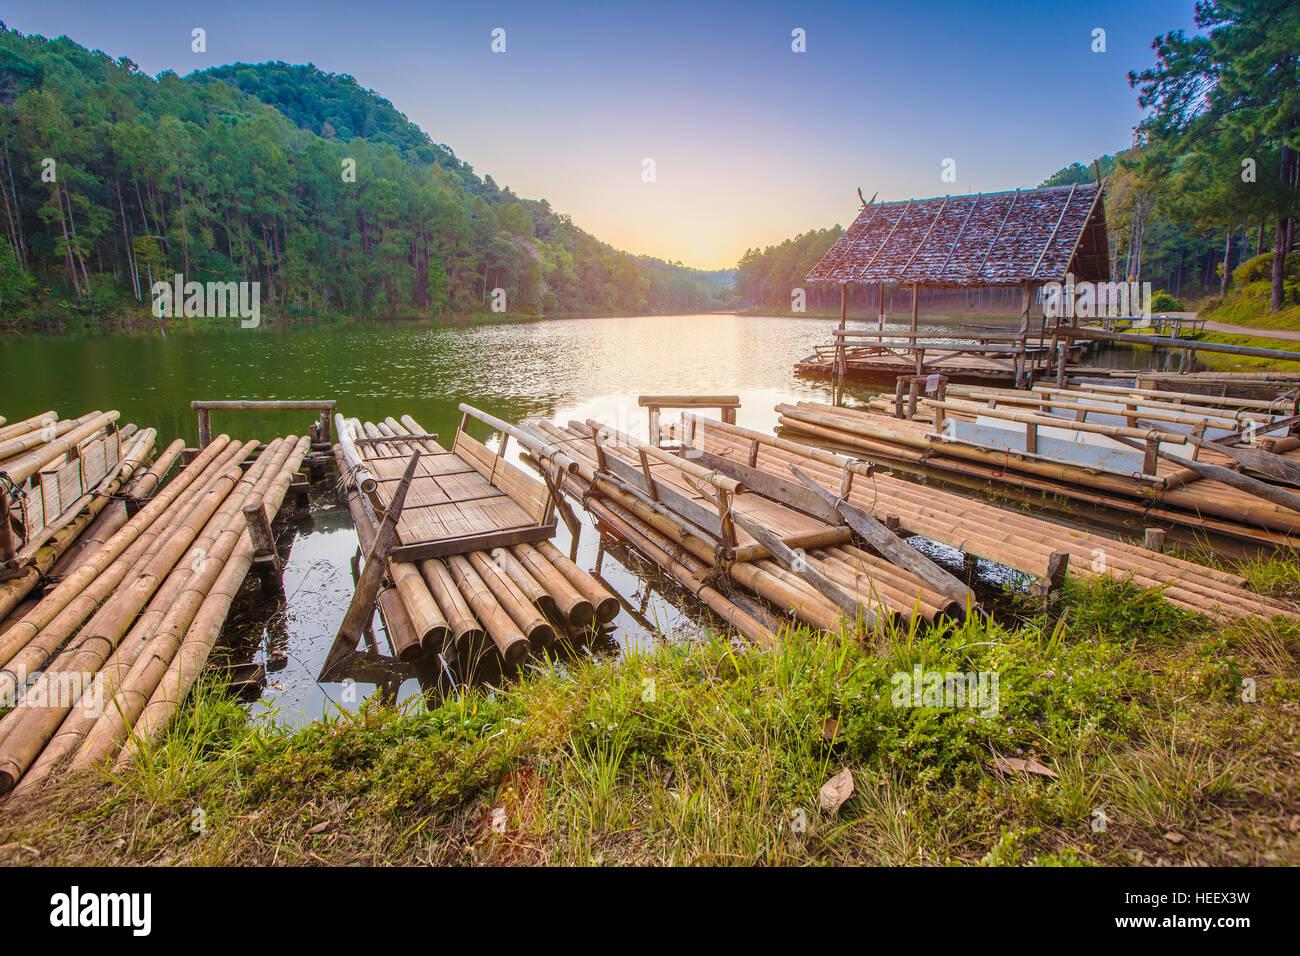 Il bambù rafting sul fiume in Pang Oung park Mae Hong Son provincia : Thailandia Immagini Stock